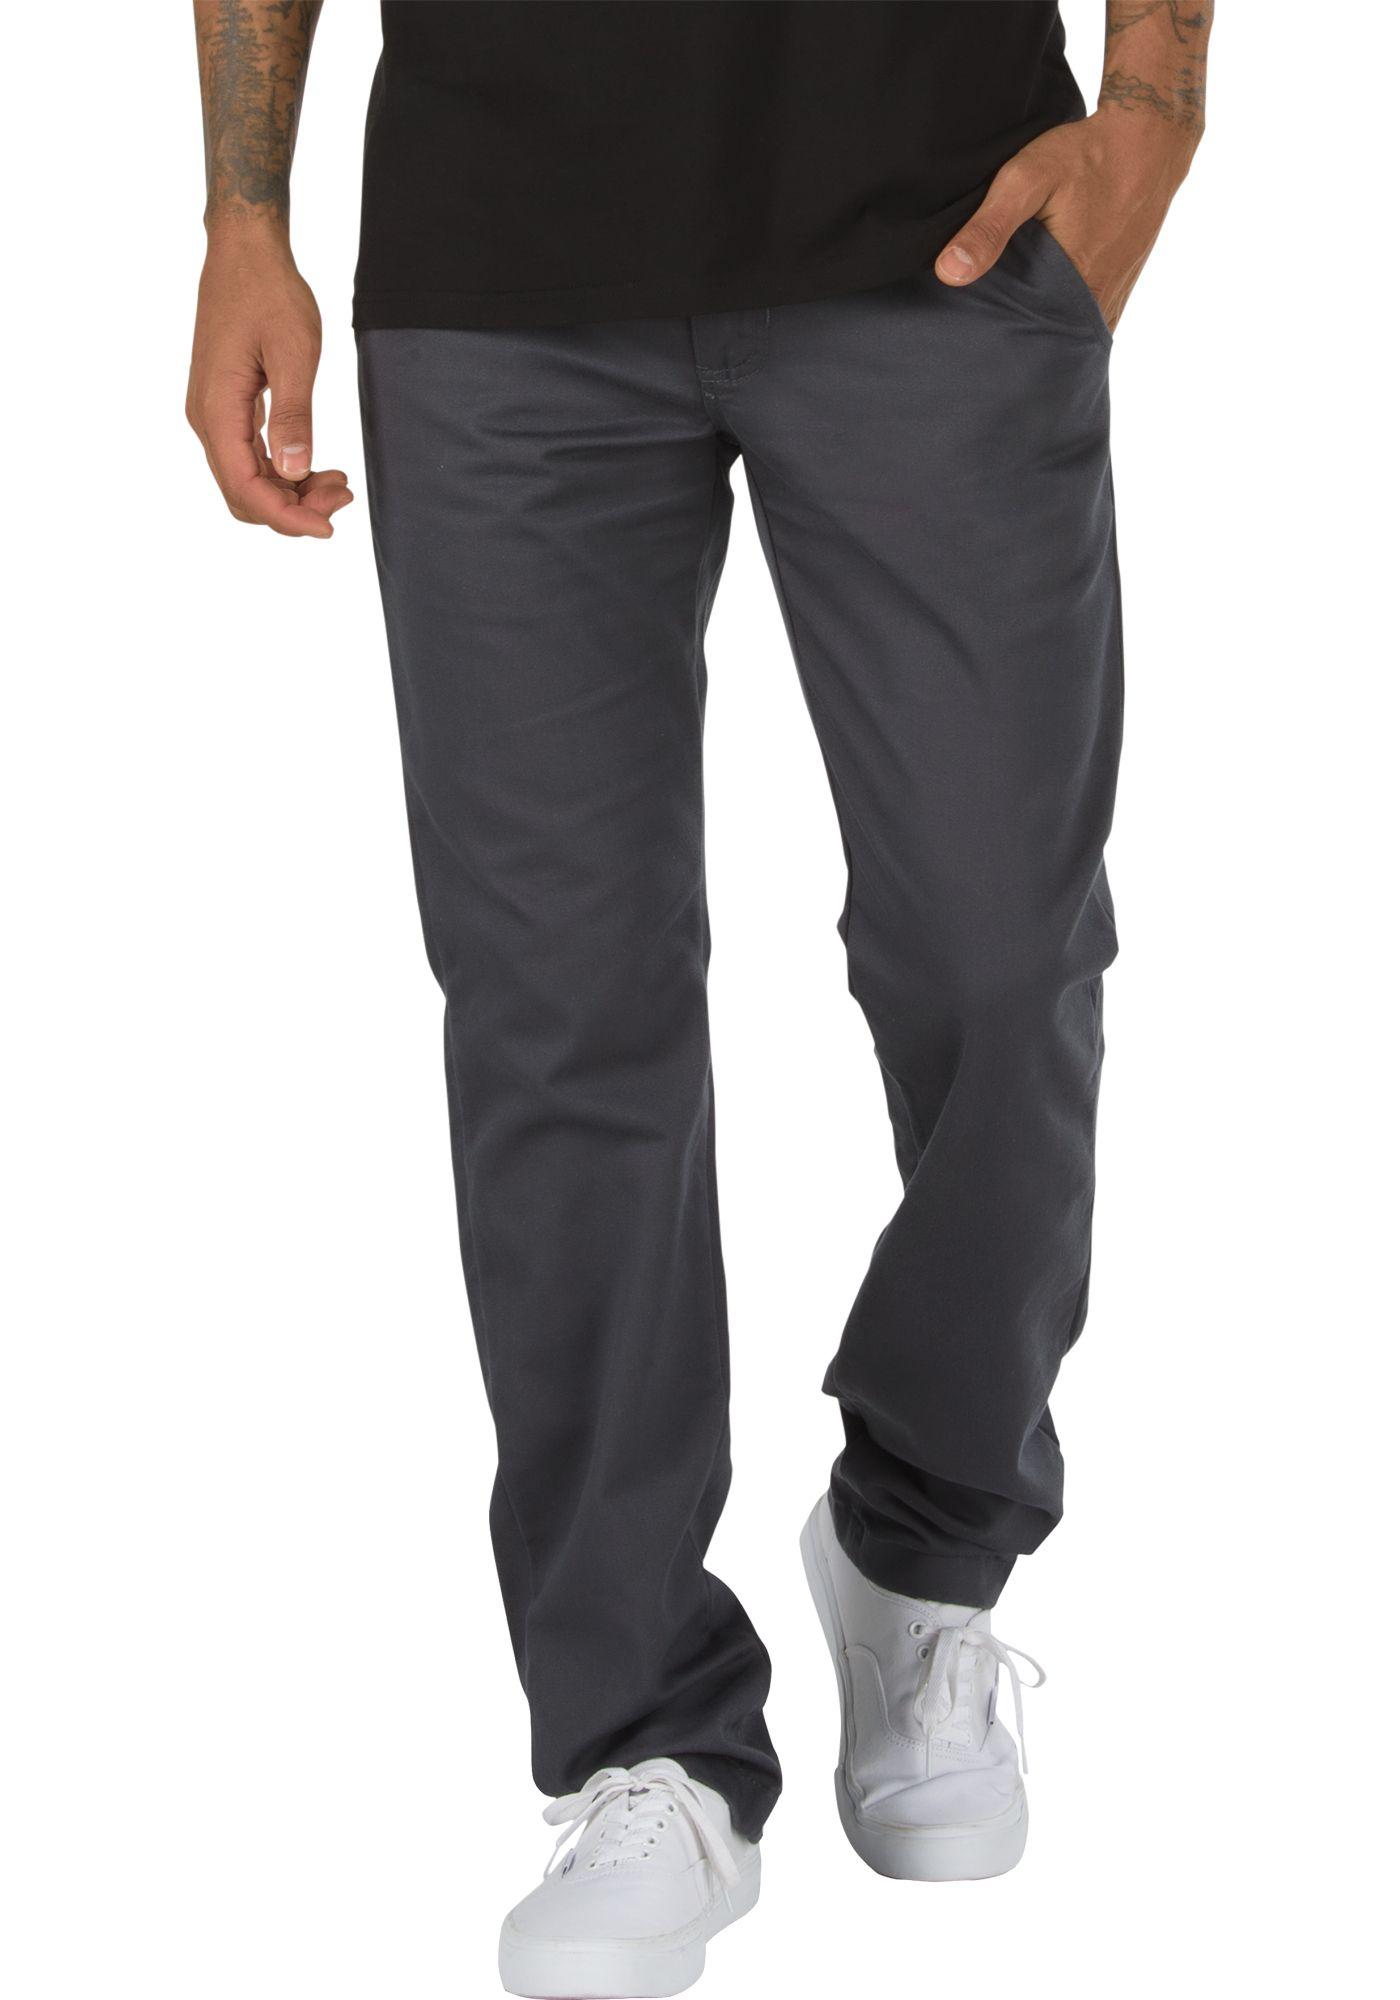 Vans Men's Authentic Chino Stretch Pants